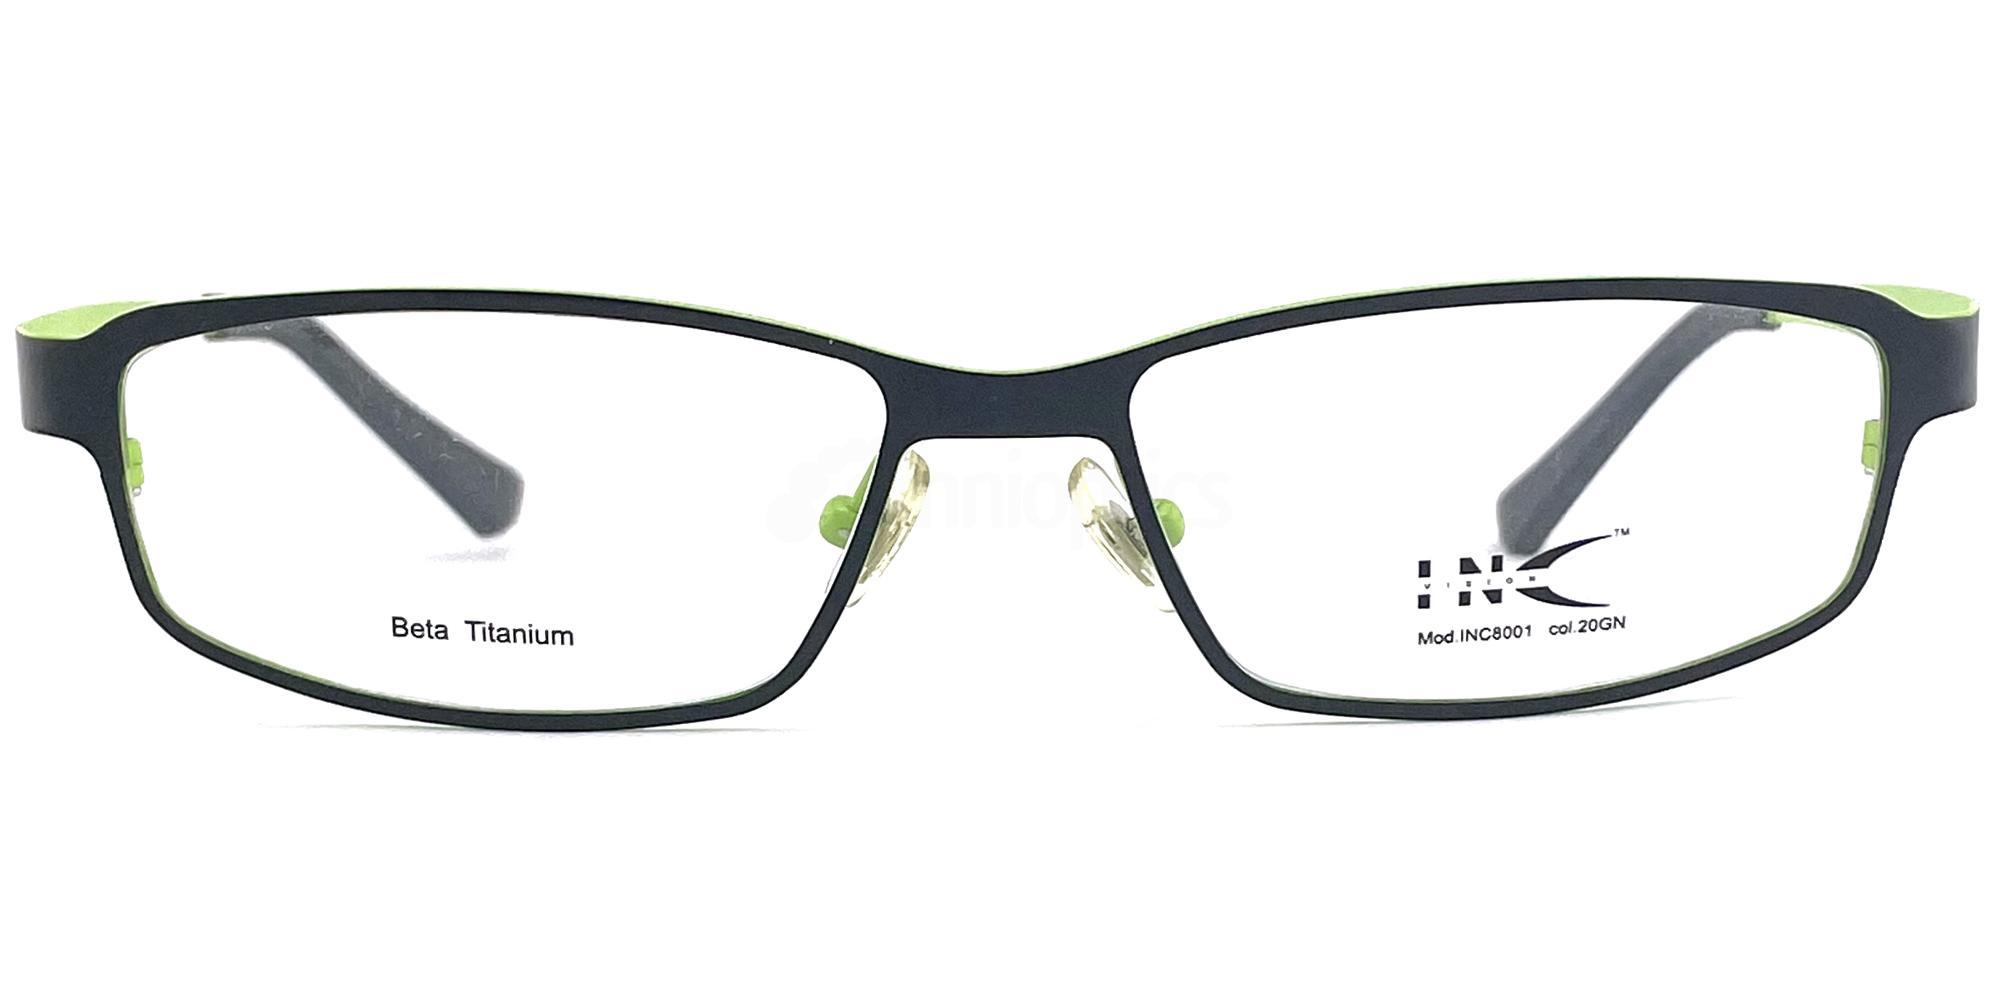 20GN INC 8001 , INC Vision